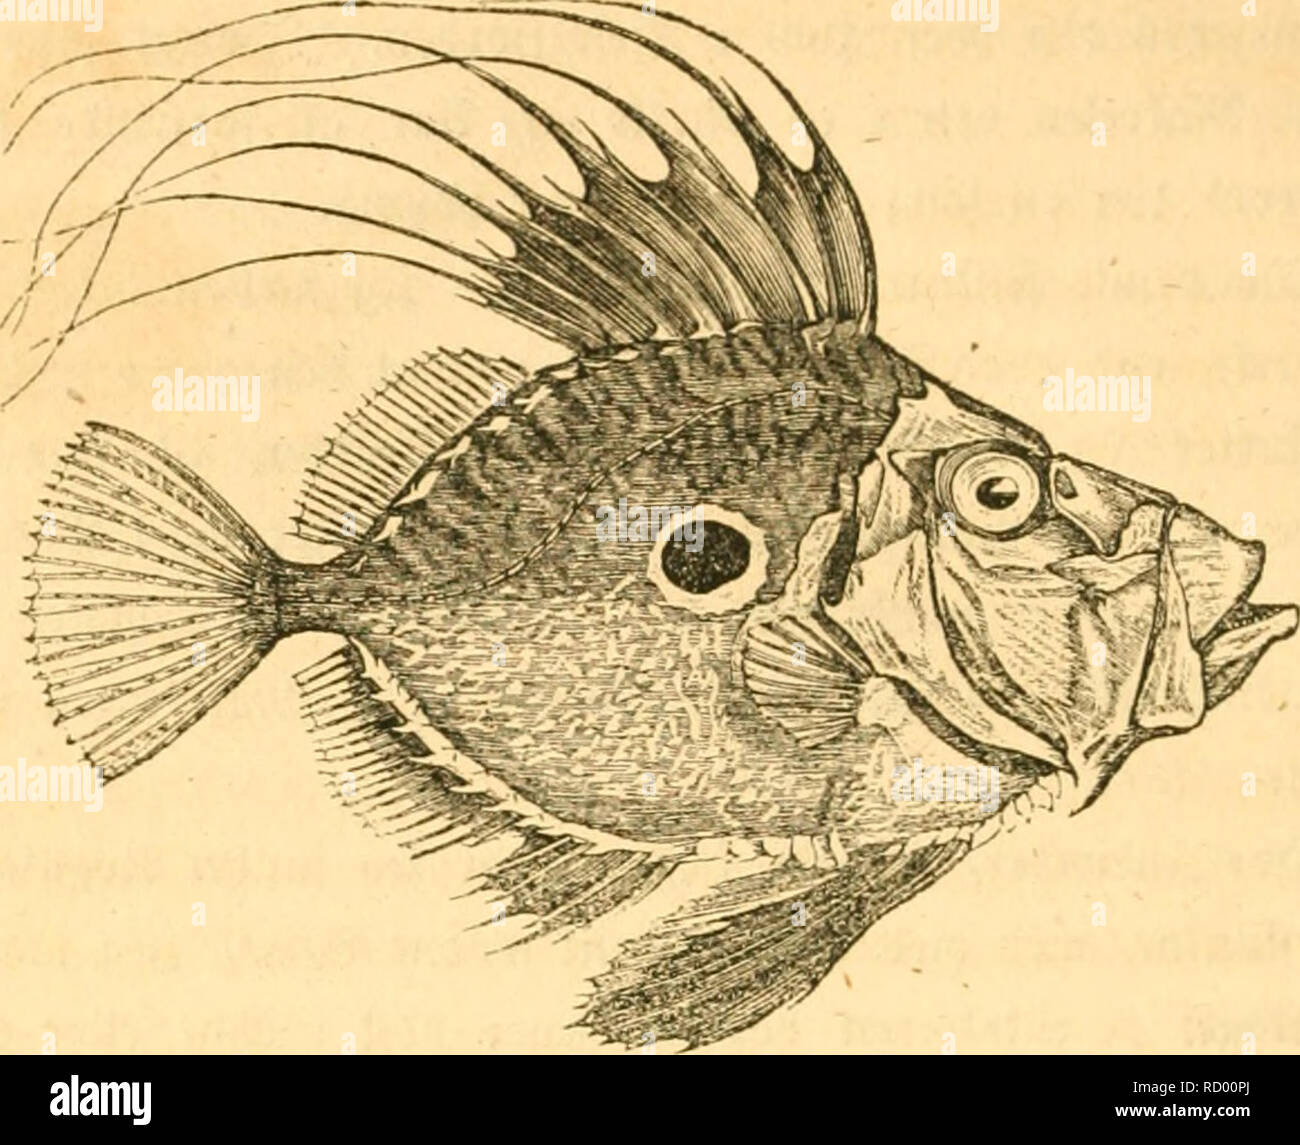 . Danmarks fiske. Fishes. 2r8. m <Zt, Retens ^iffcn CaSeus Faber liinn.). ht et i og for ftg fcto rimeligt, at benne ^ifP, [om er temmelig almin* belig omfring bet fpbligc Snglanb, (faa at man cnbog l)ar ©rempier paa, at flere enb CO Snbioiber erc tagne i et ©arn ^aa een ©ang), fom fecé paa SifVetoroct i Conbon ncrjten Ijelc ©ommercn, og fom fi;ne6 at lege oeb ben en* gelf?e S:^amborg. ©fter ^lod) (Fulle bc l^elgos lanbfFe gifPere cnbog t)aoe en fa'regen SSencrune(fe for ben, namlig Silbc* Fongc. 3eg l)ar berfor troet, at bet iffe oilbe occre ooerftubigt, at giøre opmcrrffom paa ben. - Stock Image